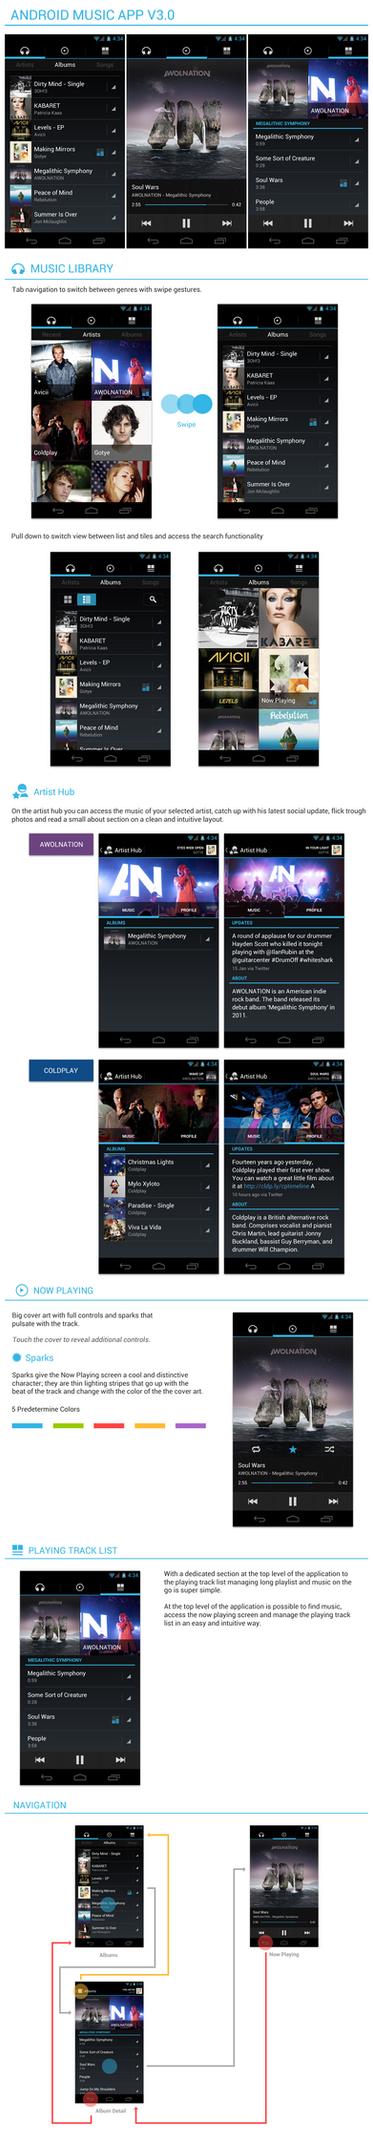 Android Music App V3.0 by Febernovo